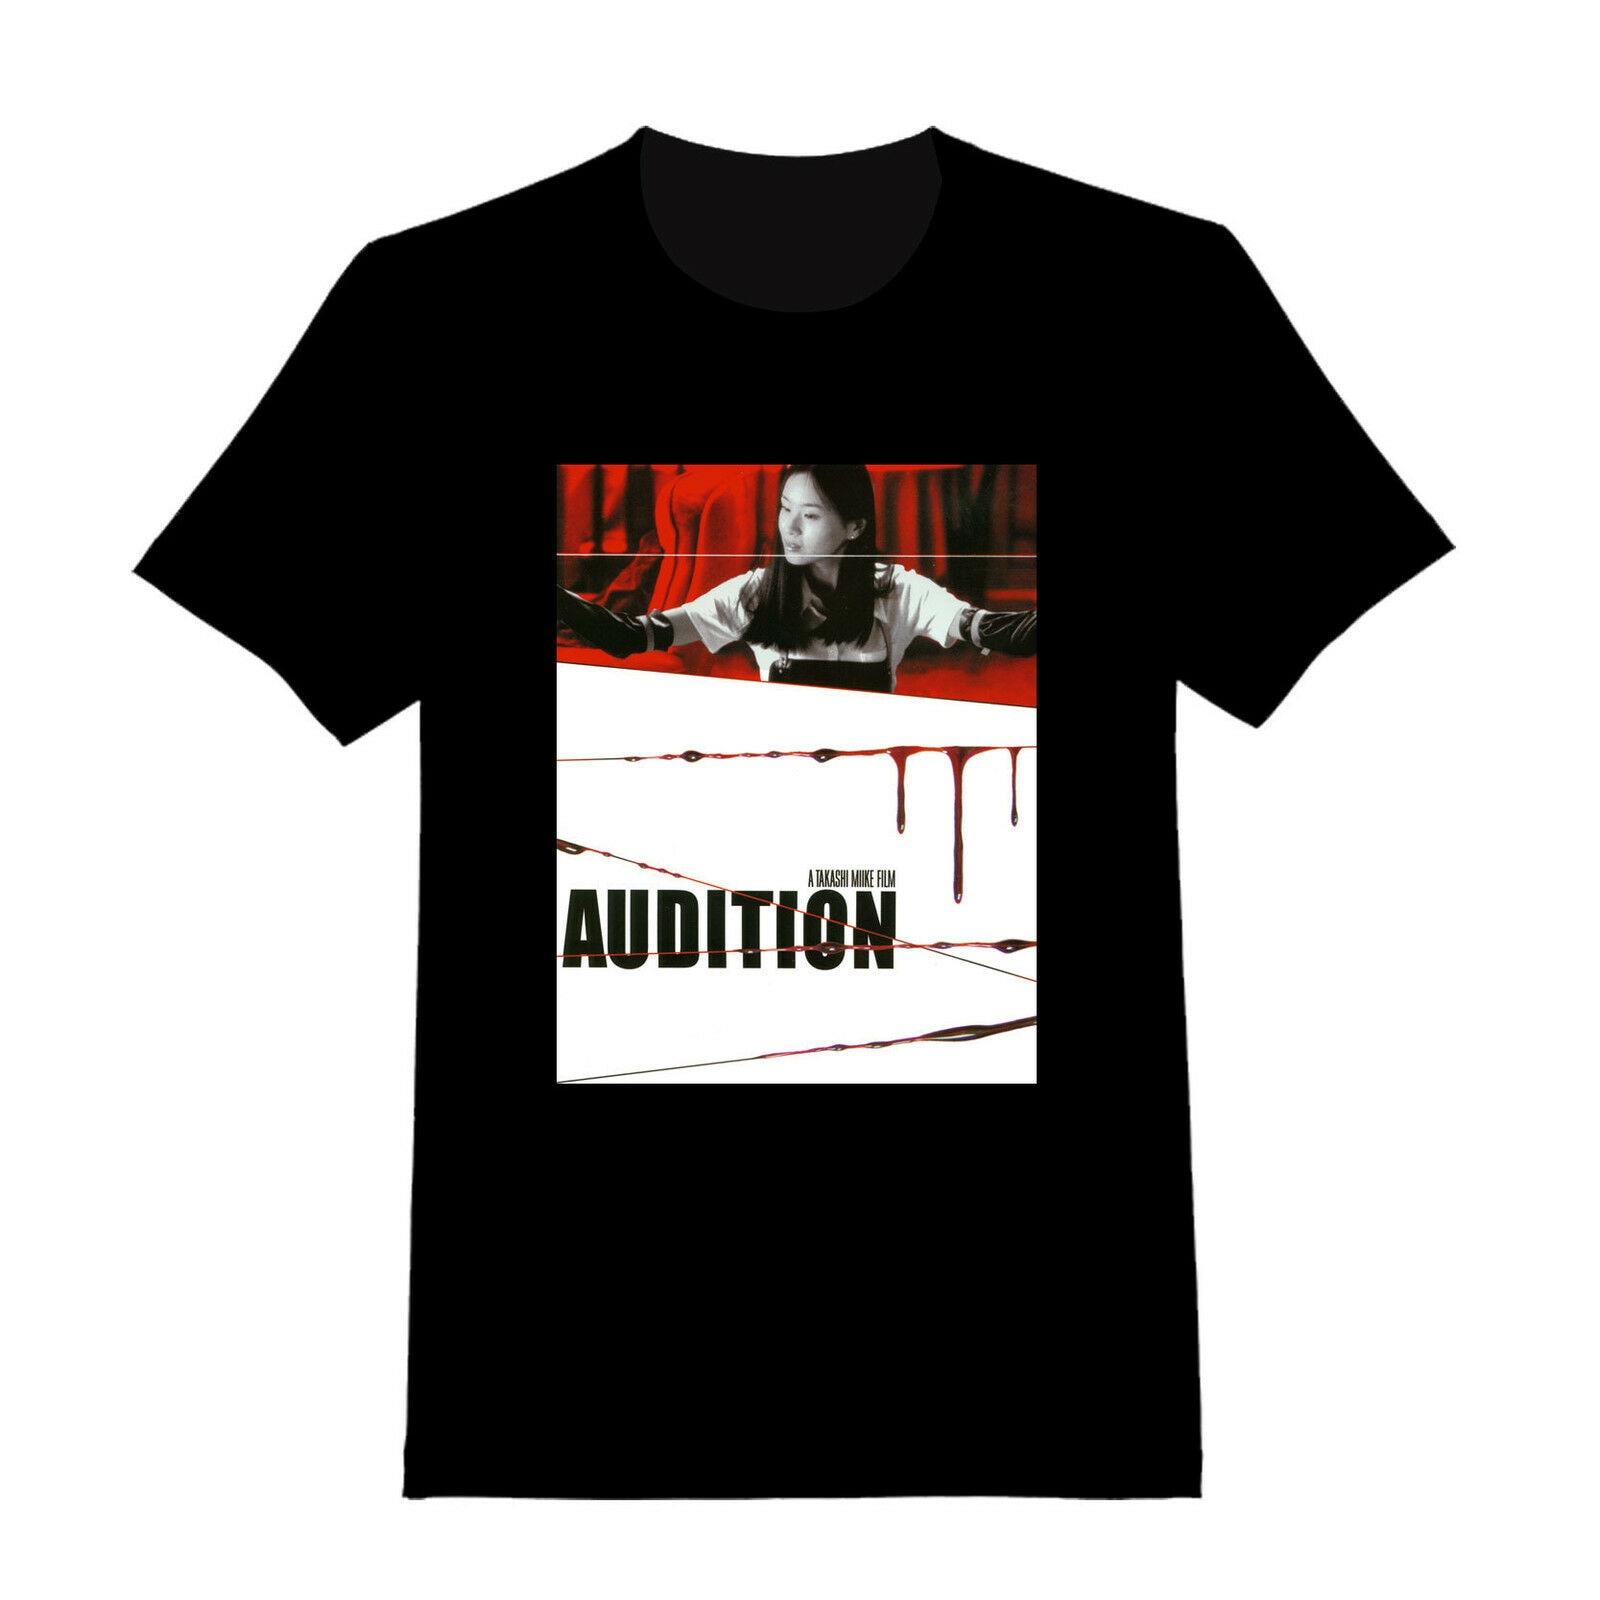 Audition #1-camiseta personalizada (163) - Takashi Miike personalidad de alta calidad